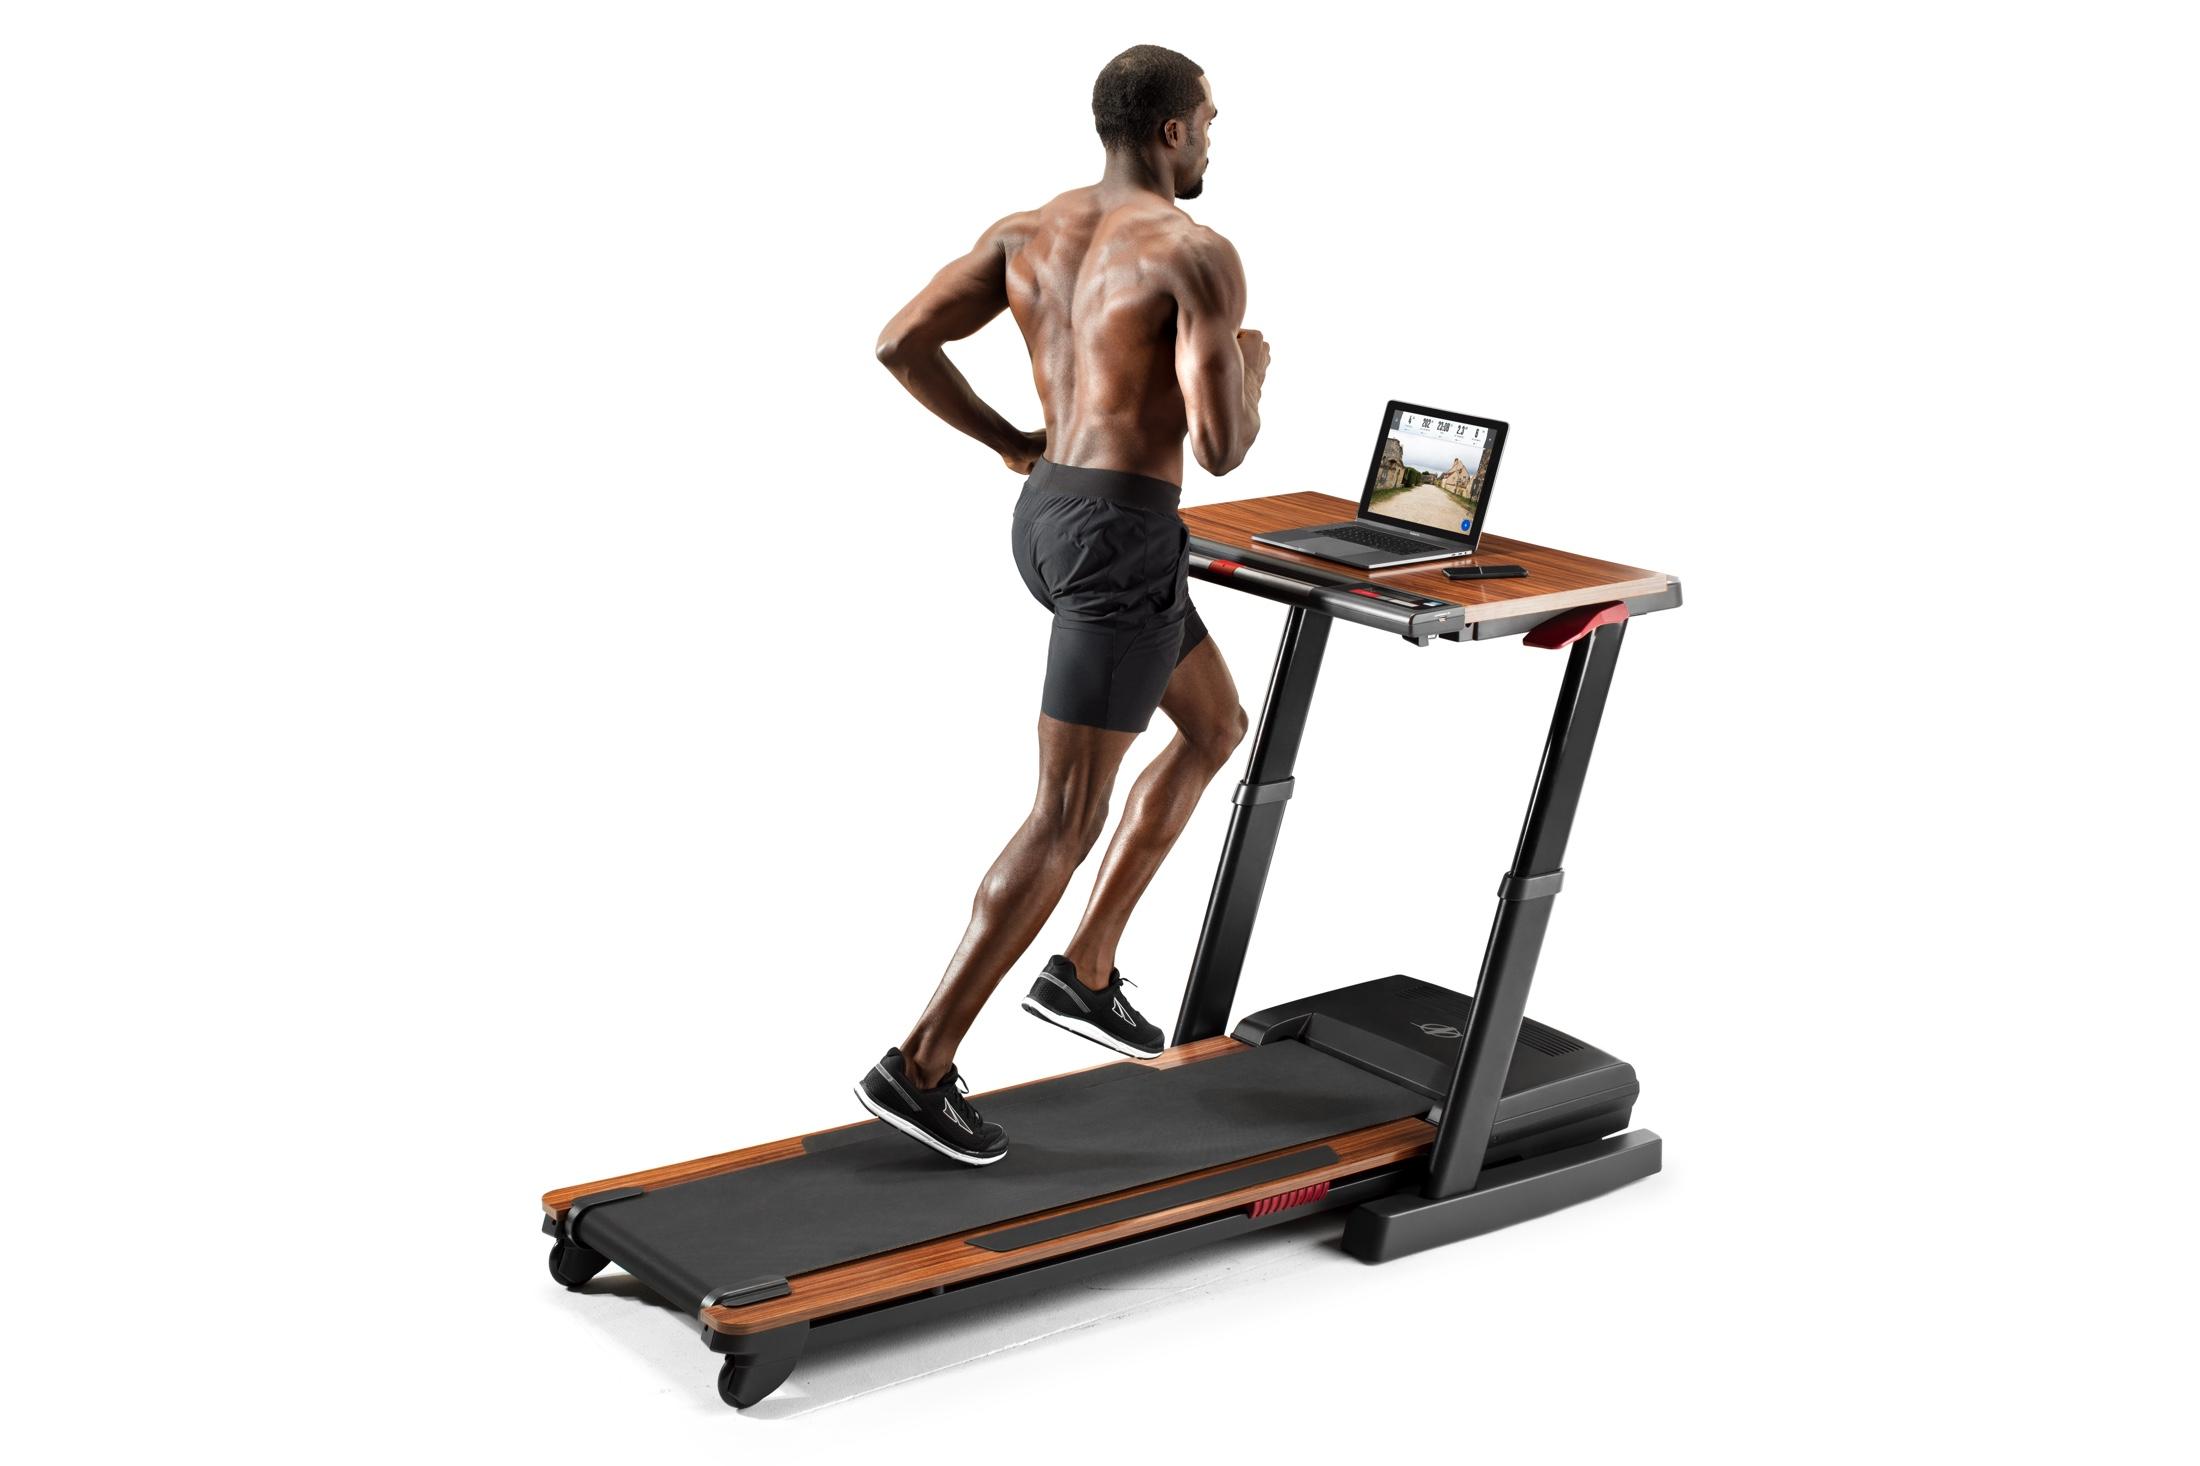 NordicTrack Treadmill Desk Platinum gallery image 5